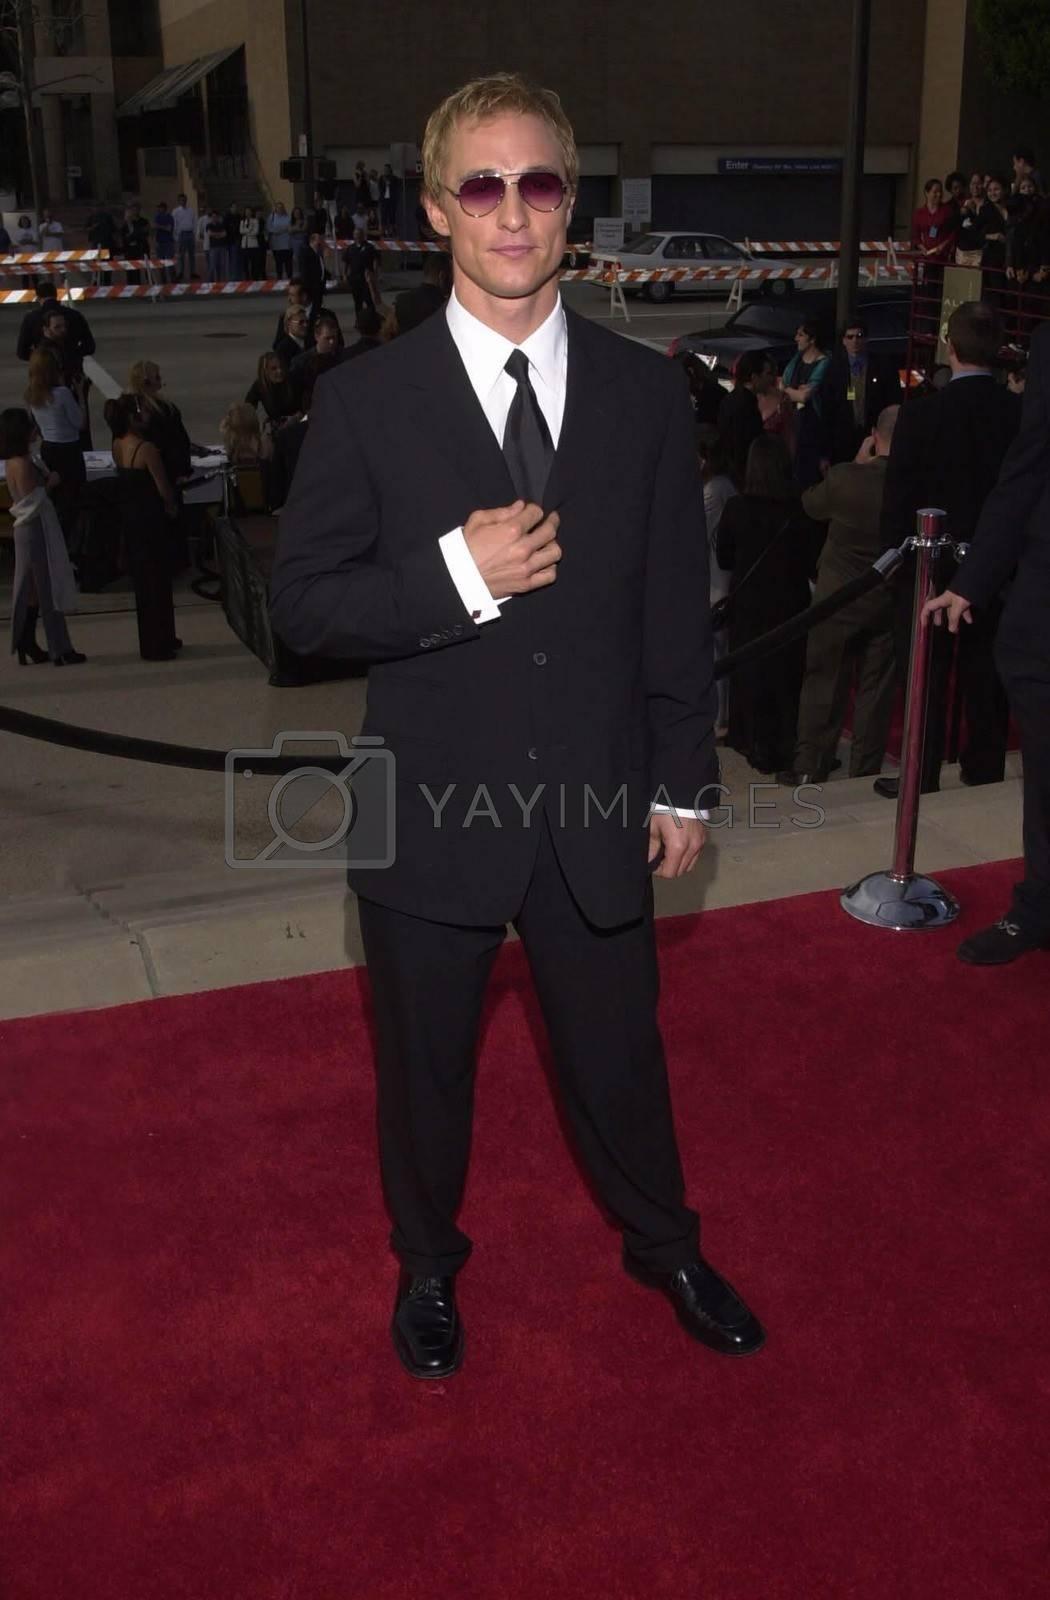 Matthew McConaughey at the 2000 Alma Awards, in Pasadena, 04-16-00